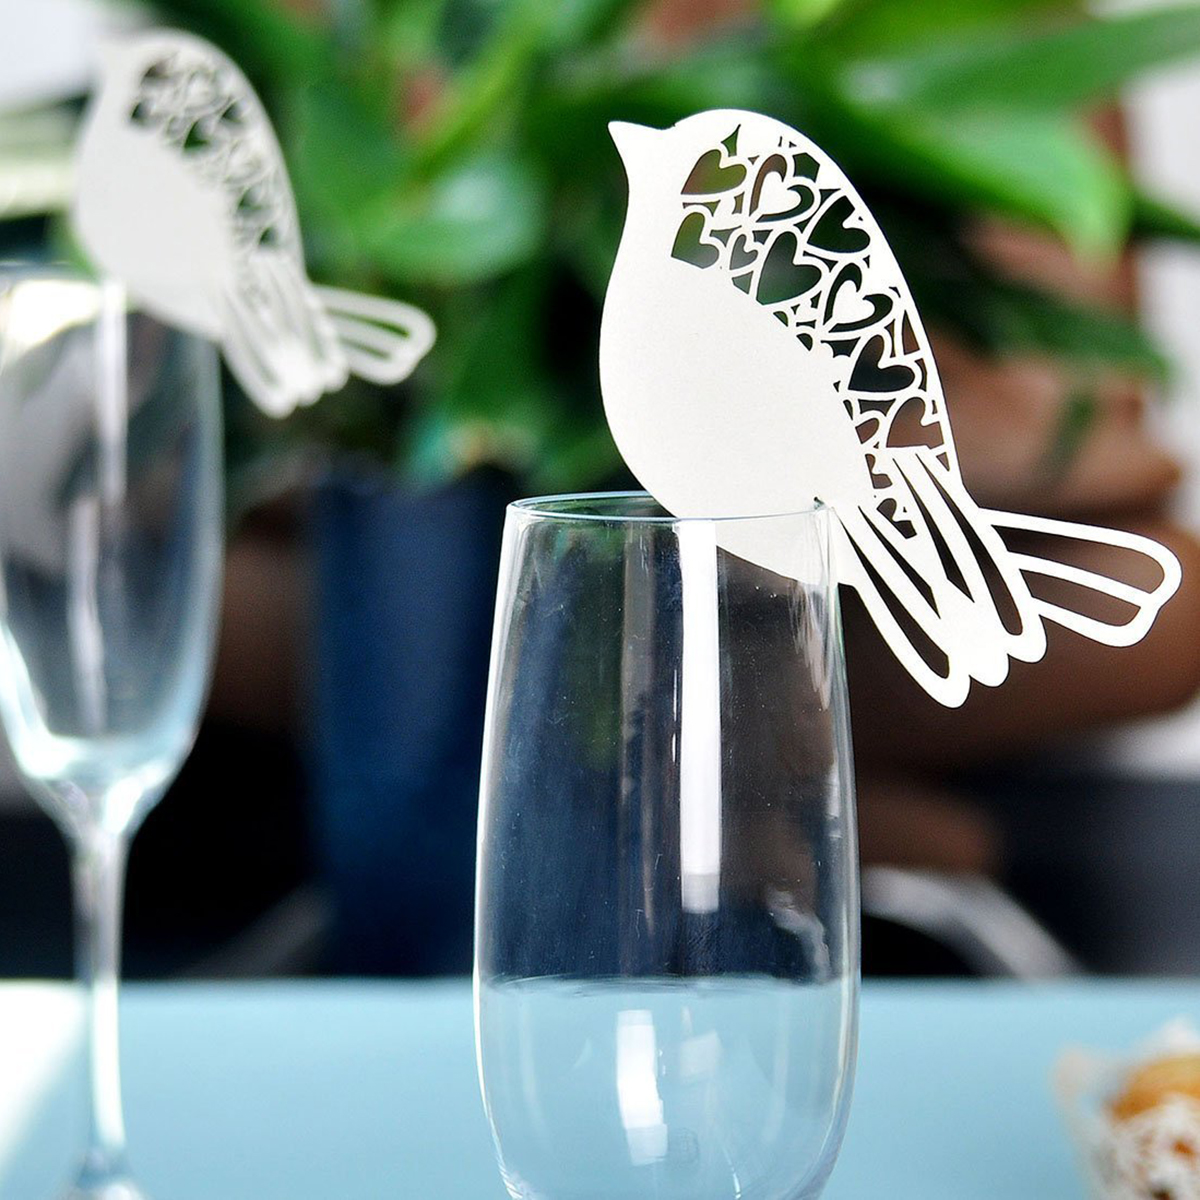 50 unids Pájaros Del Corazón Mesa Marcos Wine Glass Place Escort Nombre Tarjeta